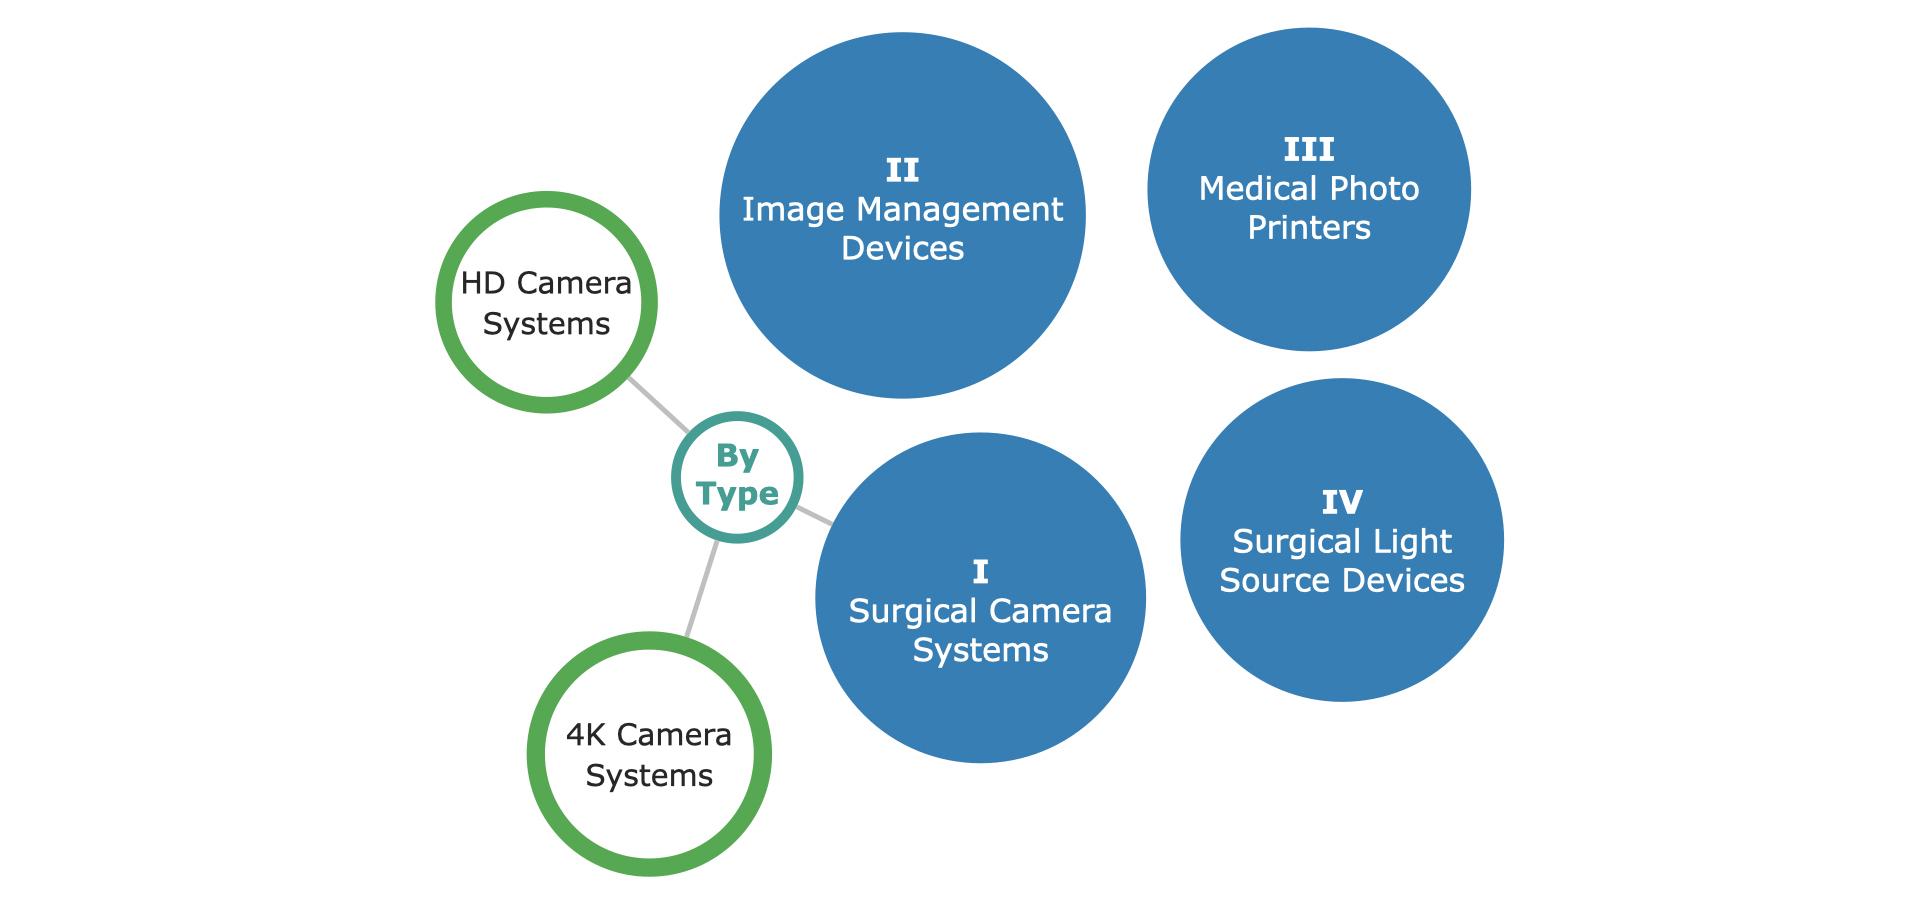 EU Video Endoscopy Market Segmentation